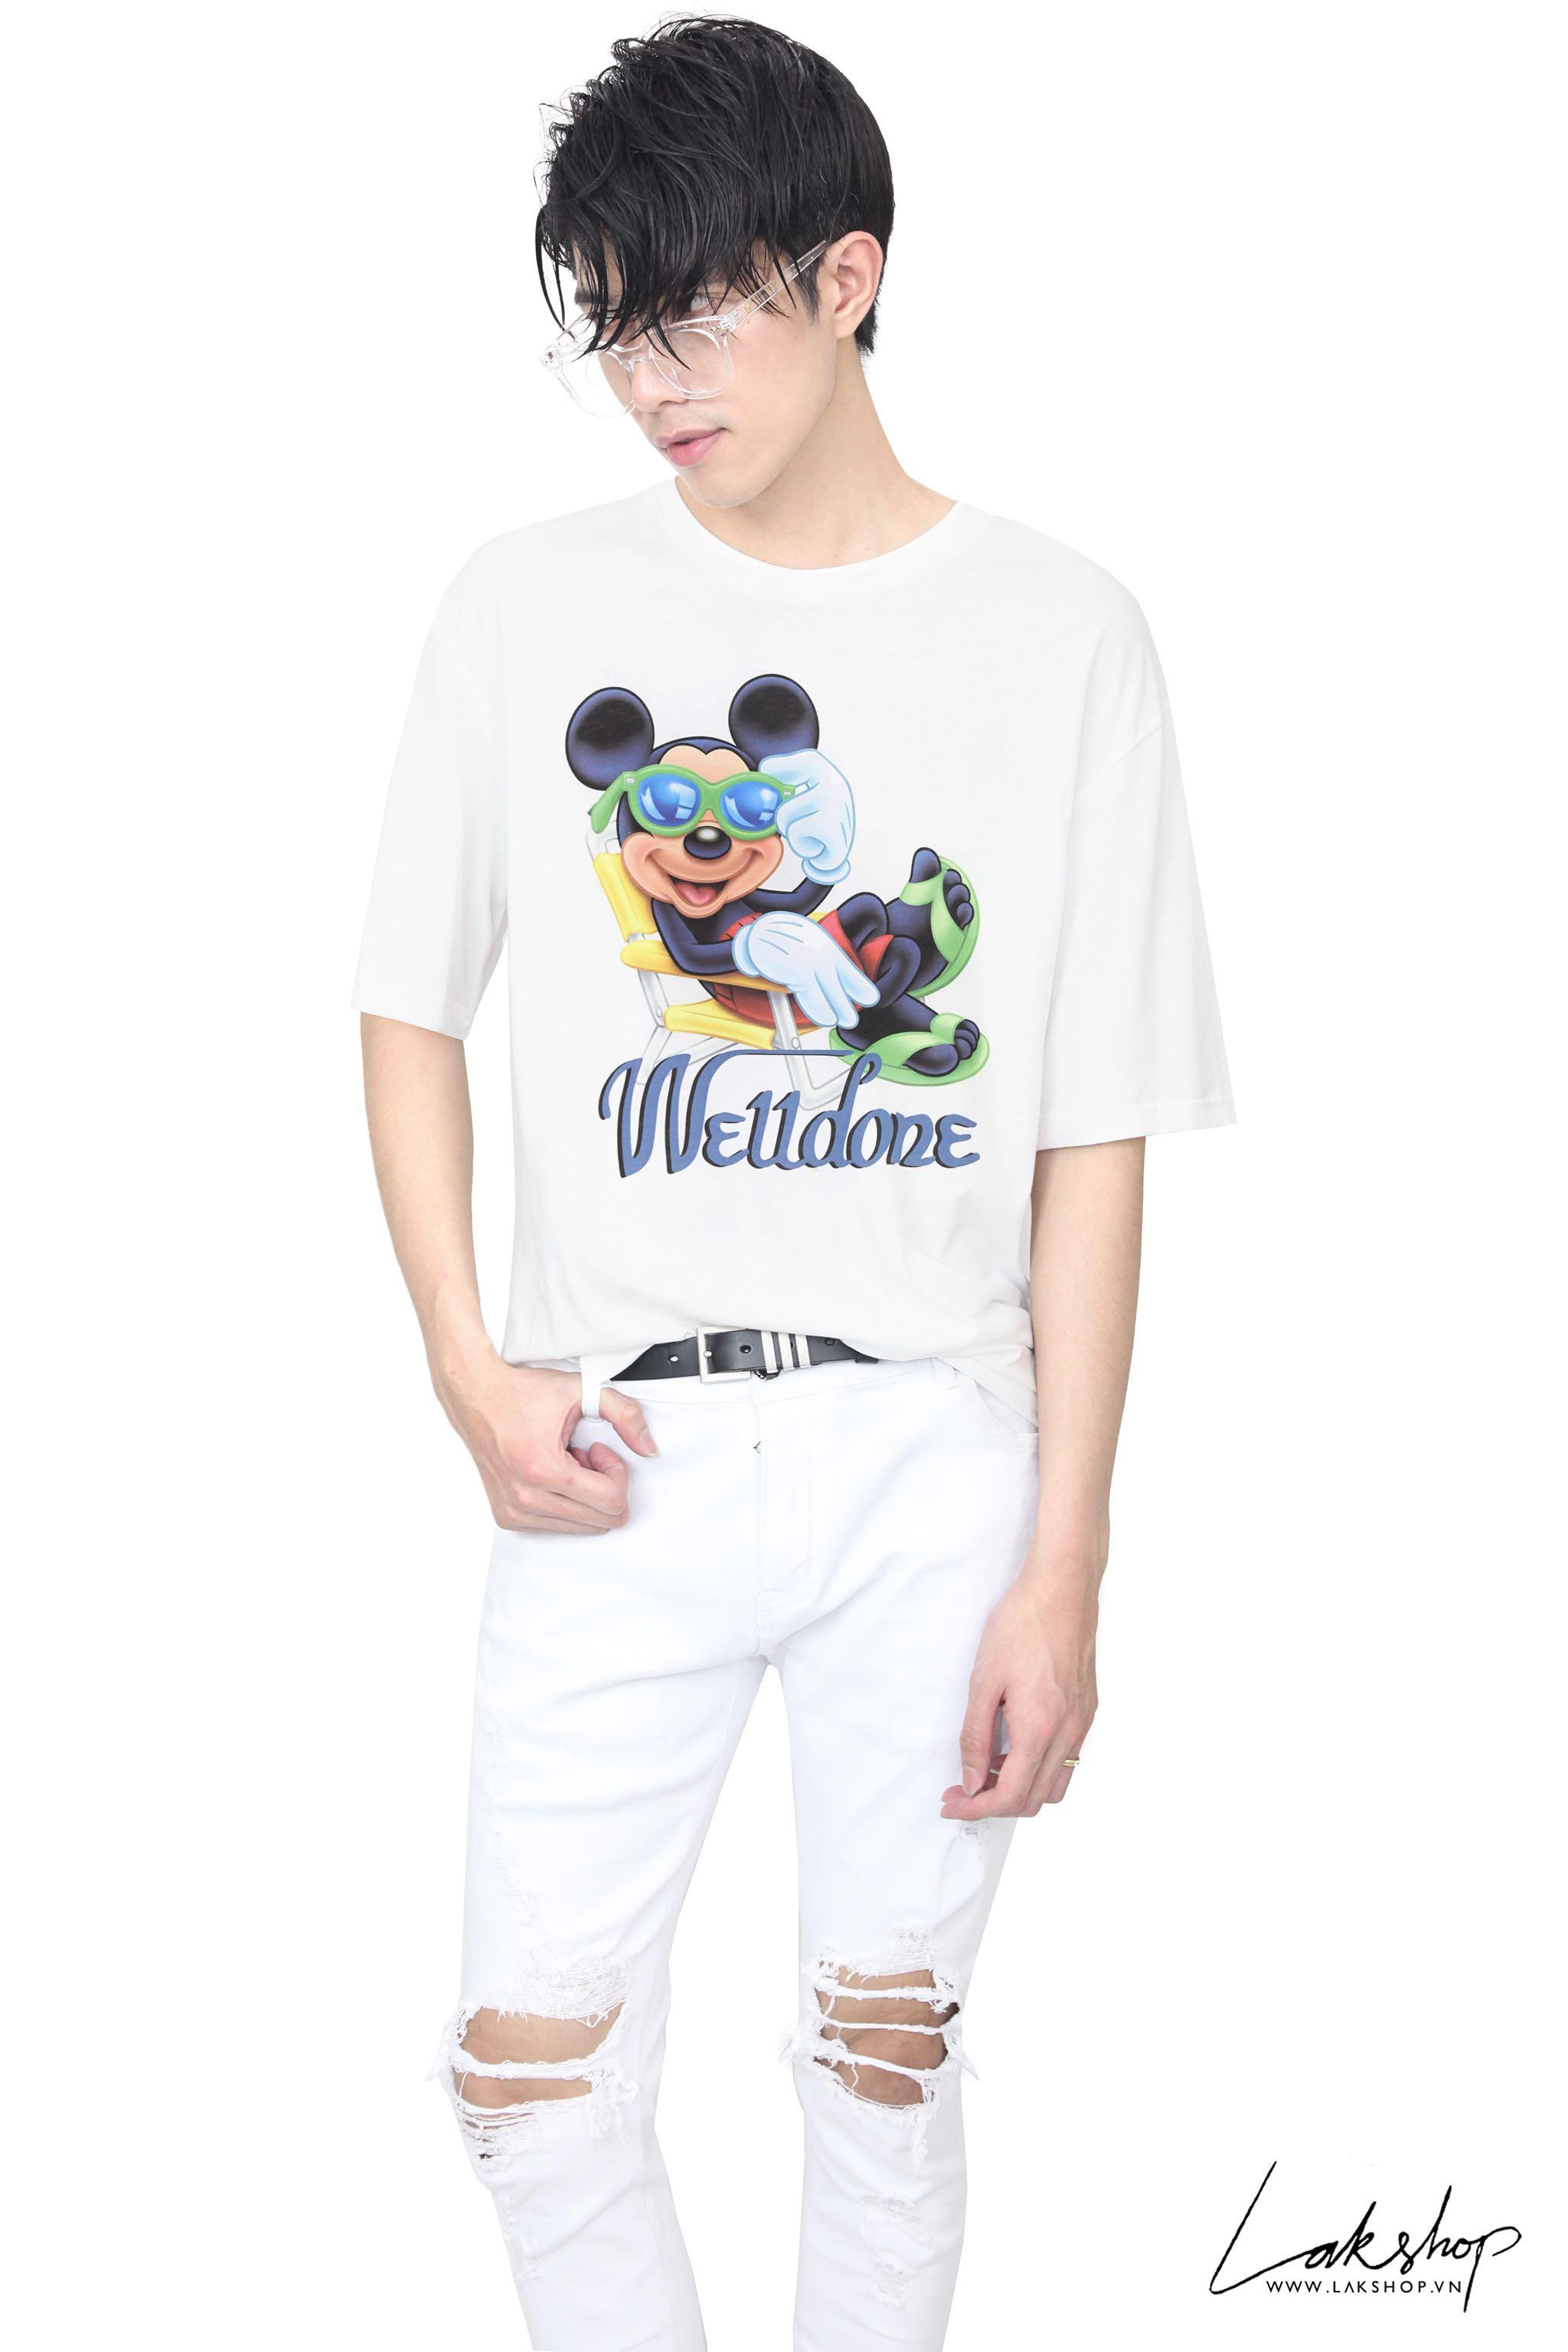 Welldone x Mickey White Oversized T-Shirt (bản đẹp 1:1) cv3